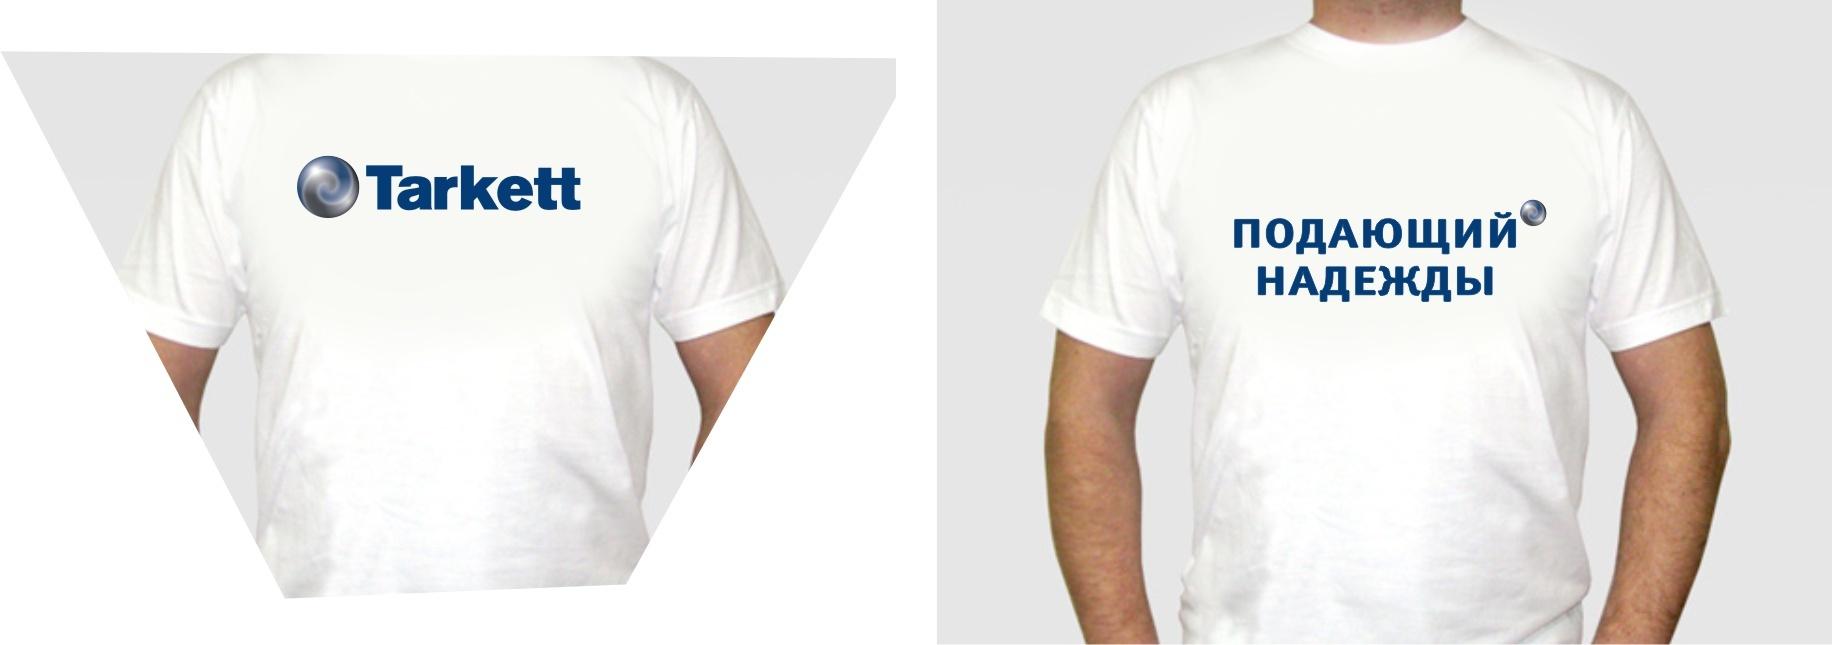 Нанесение логотипа на спецодежду компании Таркетт.